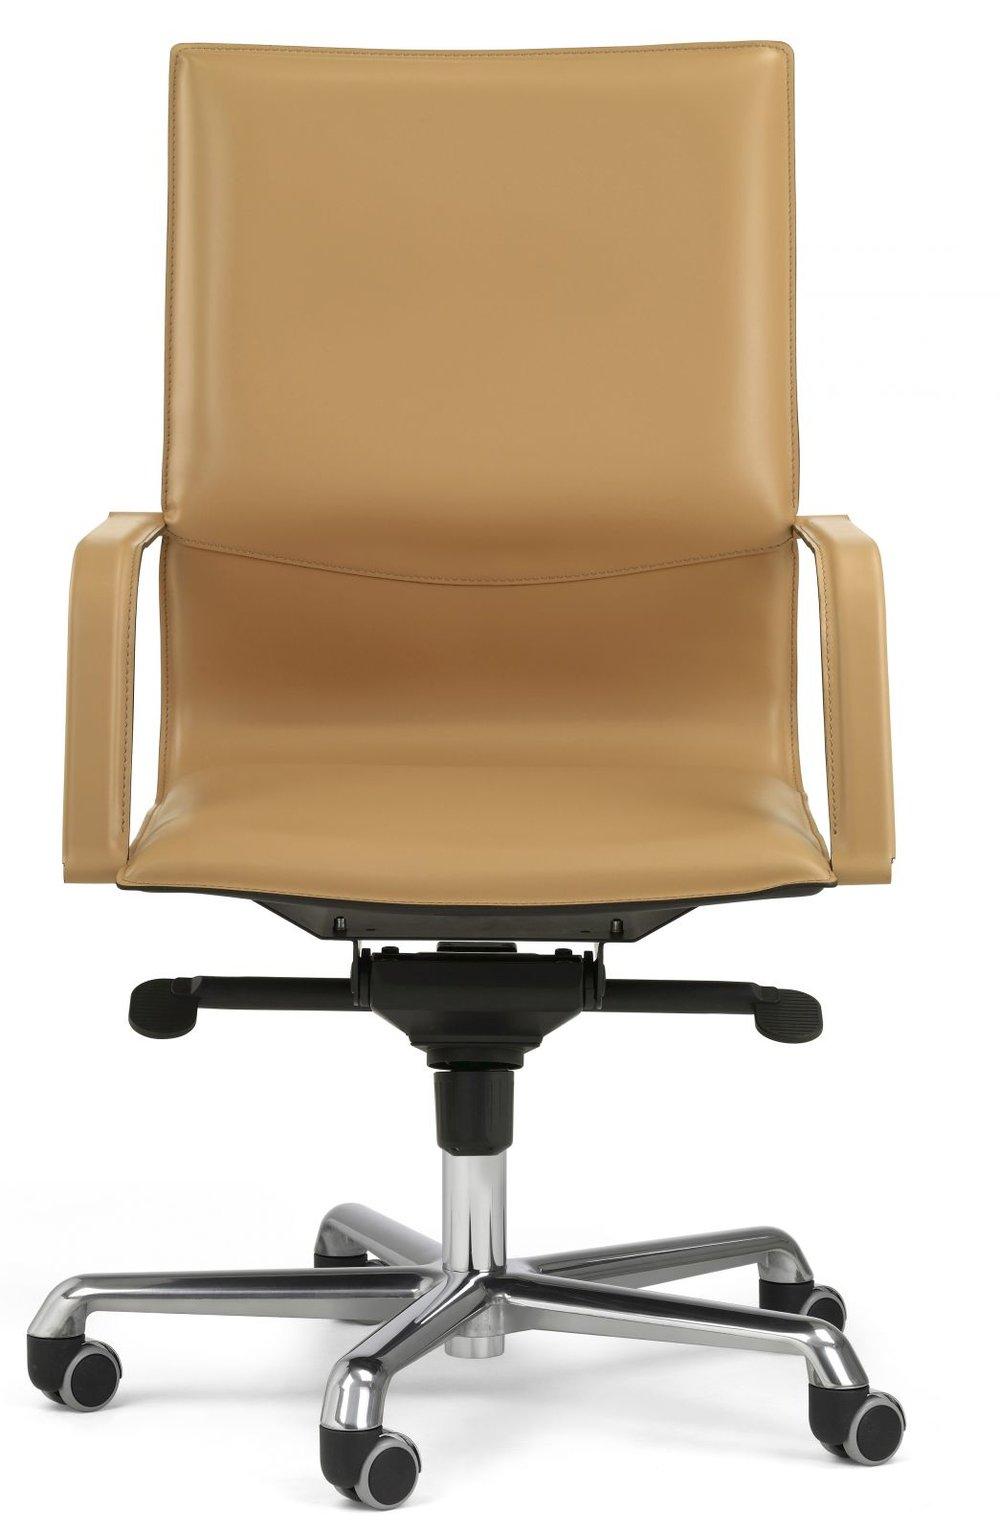 modern-office-chairs-Italian-furniture-designer-chairs (43).jpg